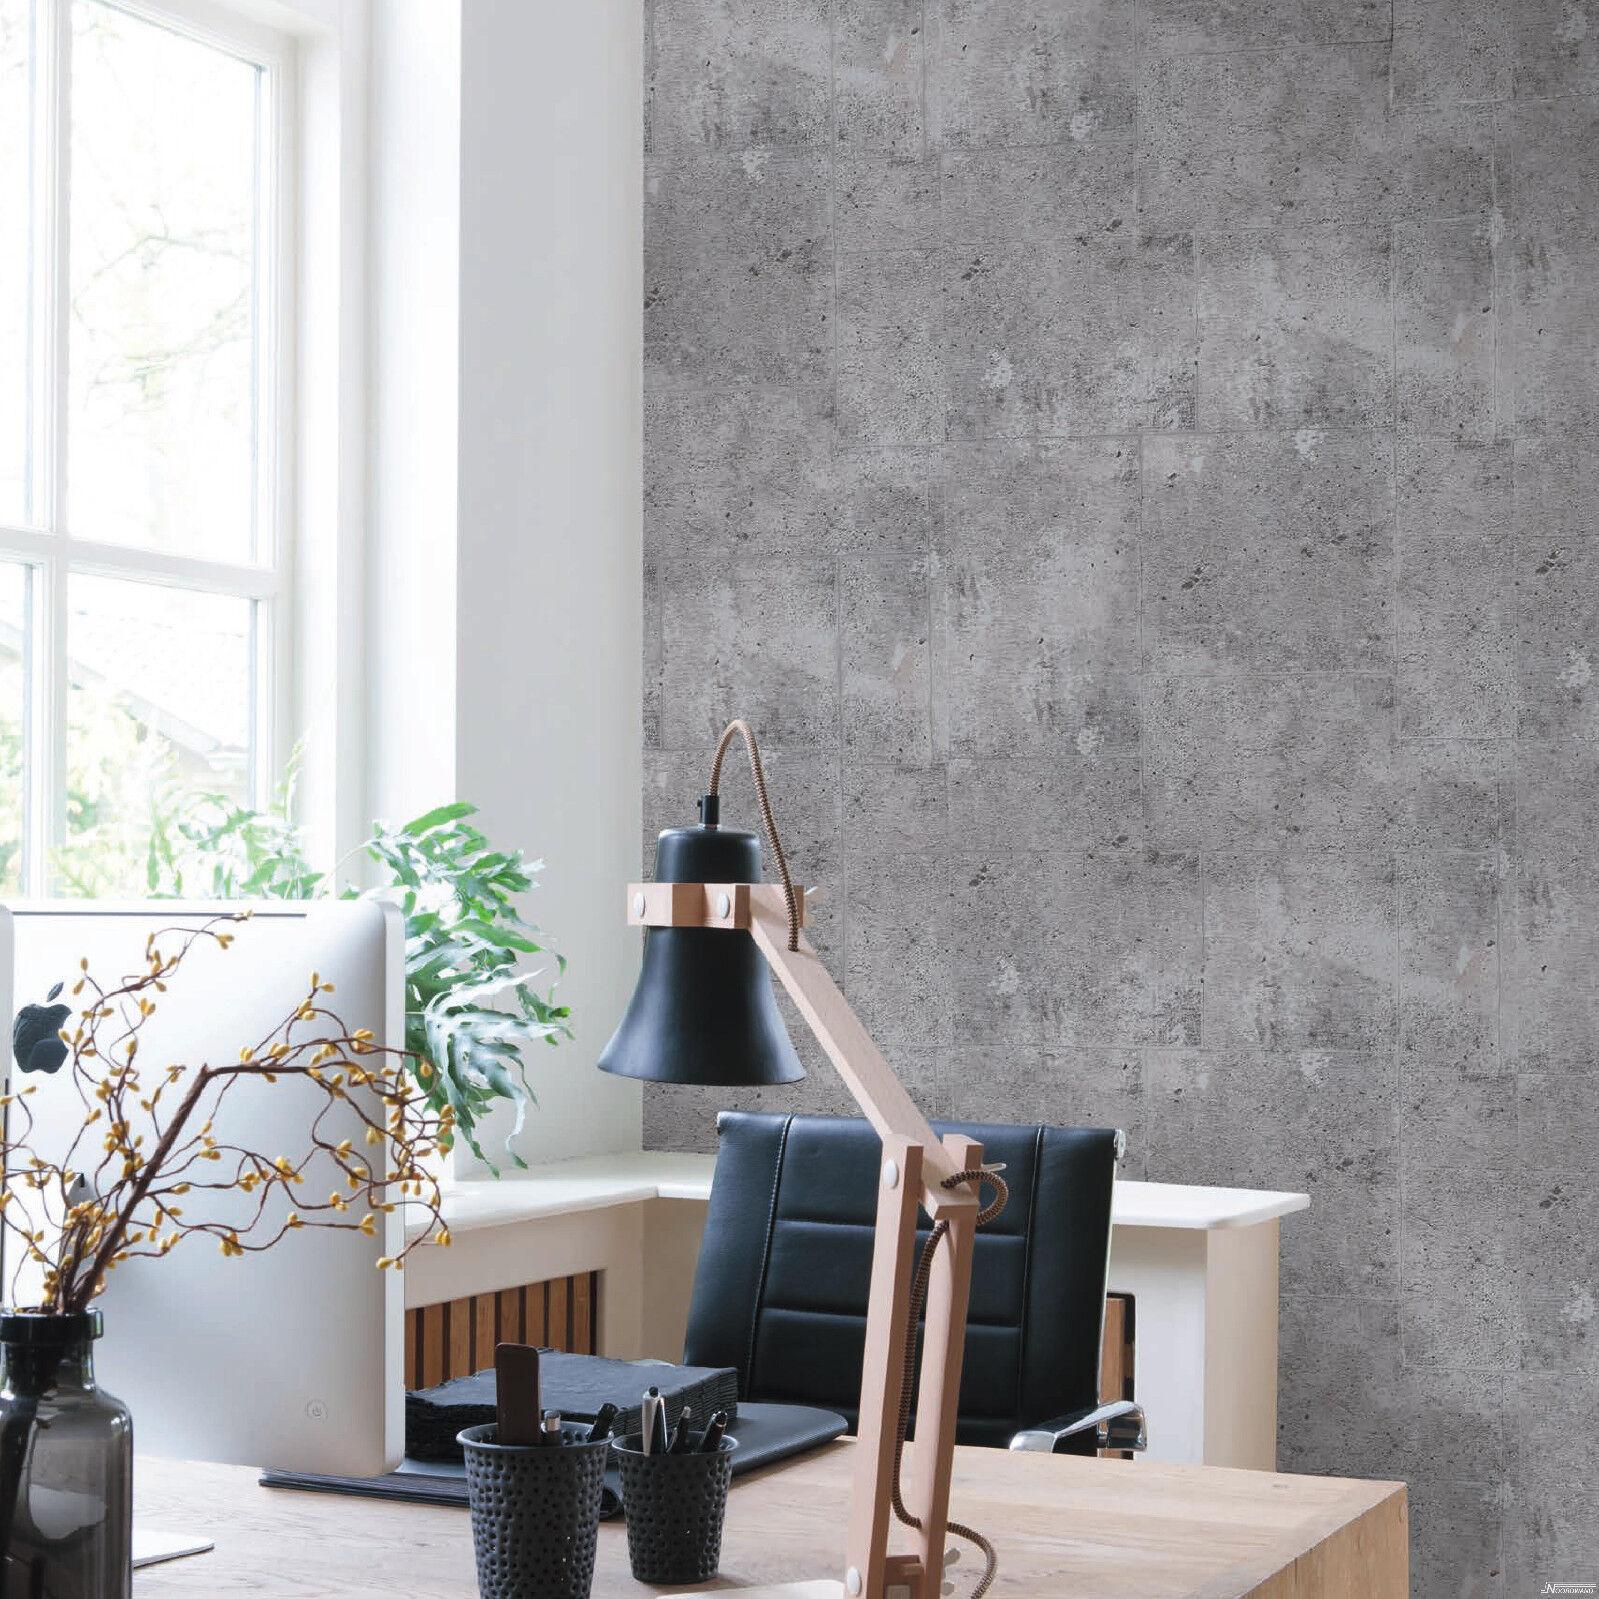 vliestapete beton optik grau betontapete industrial loft stein wand